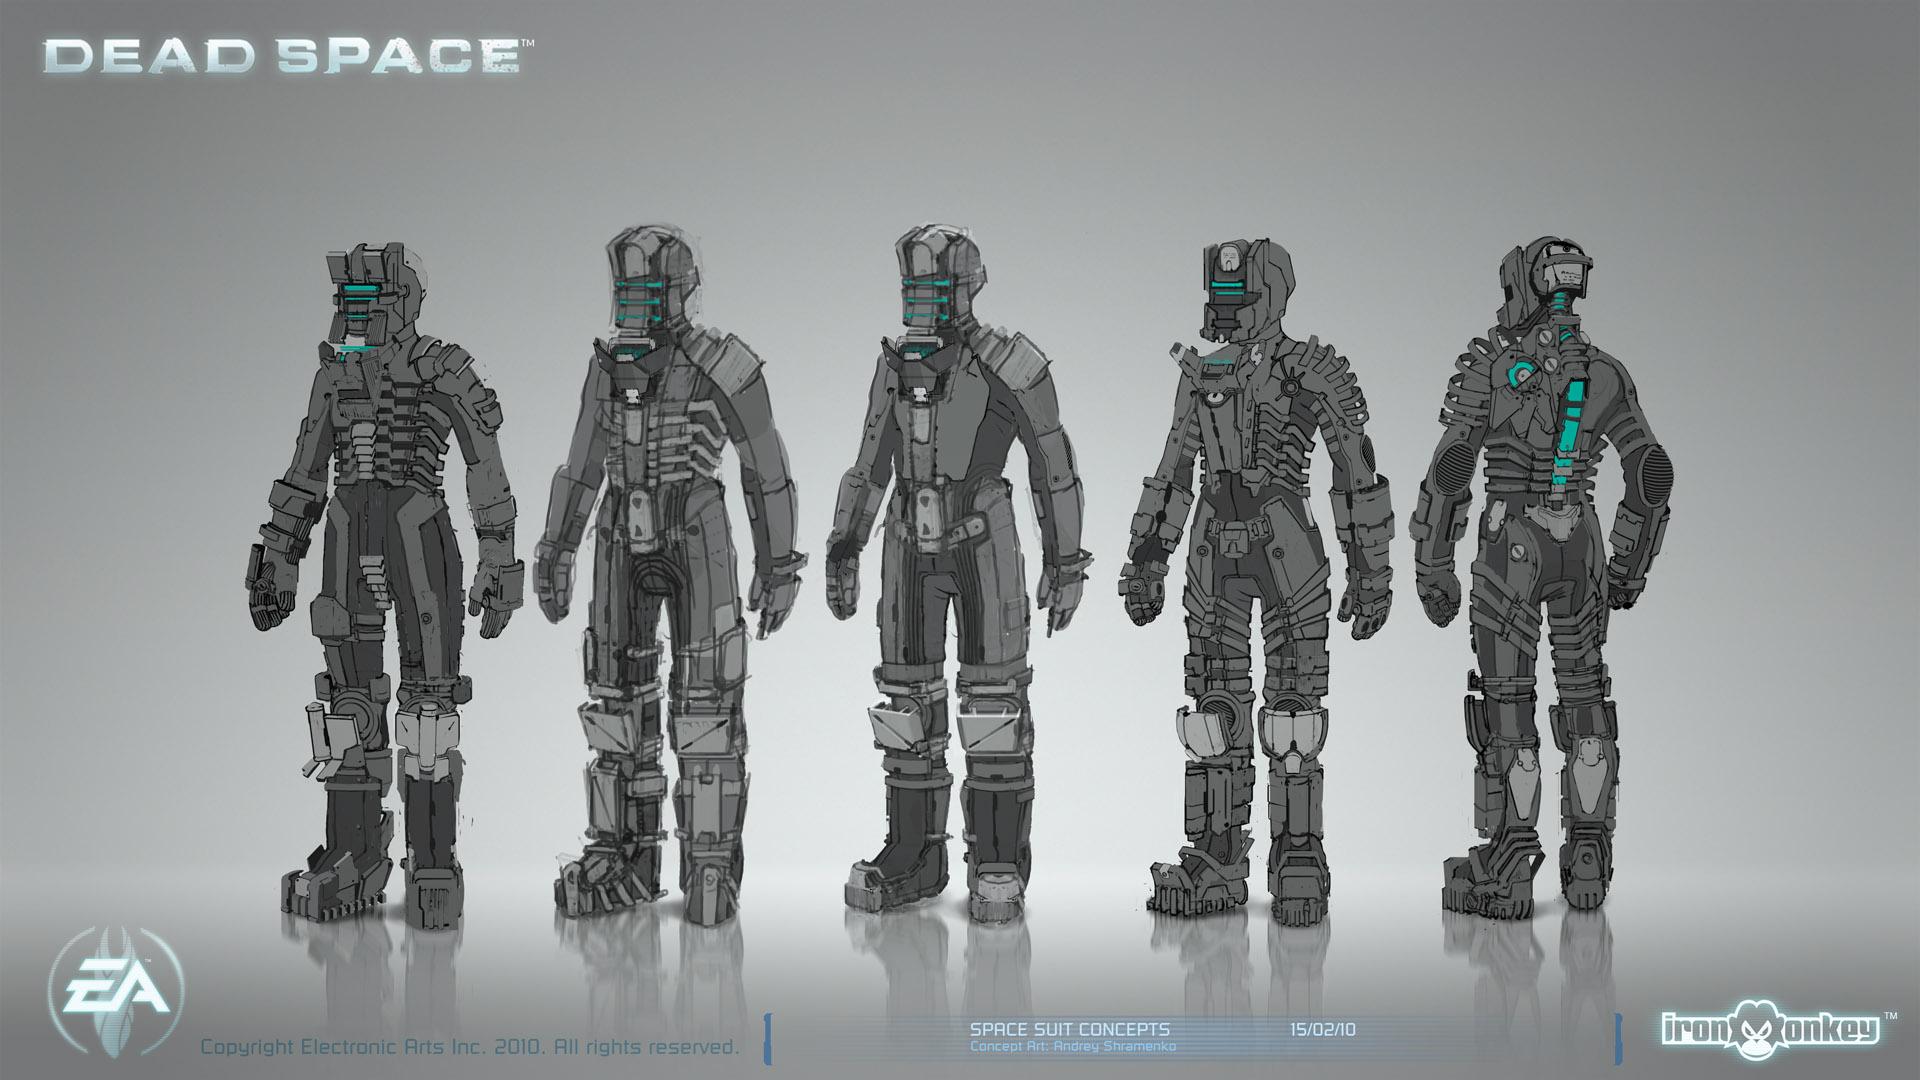 Dead Space 2 картинки (21 фото) скачать обои